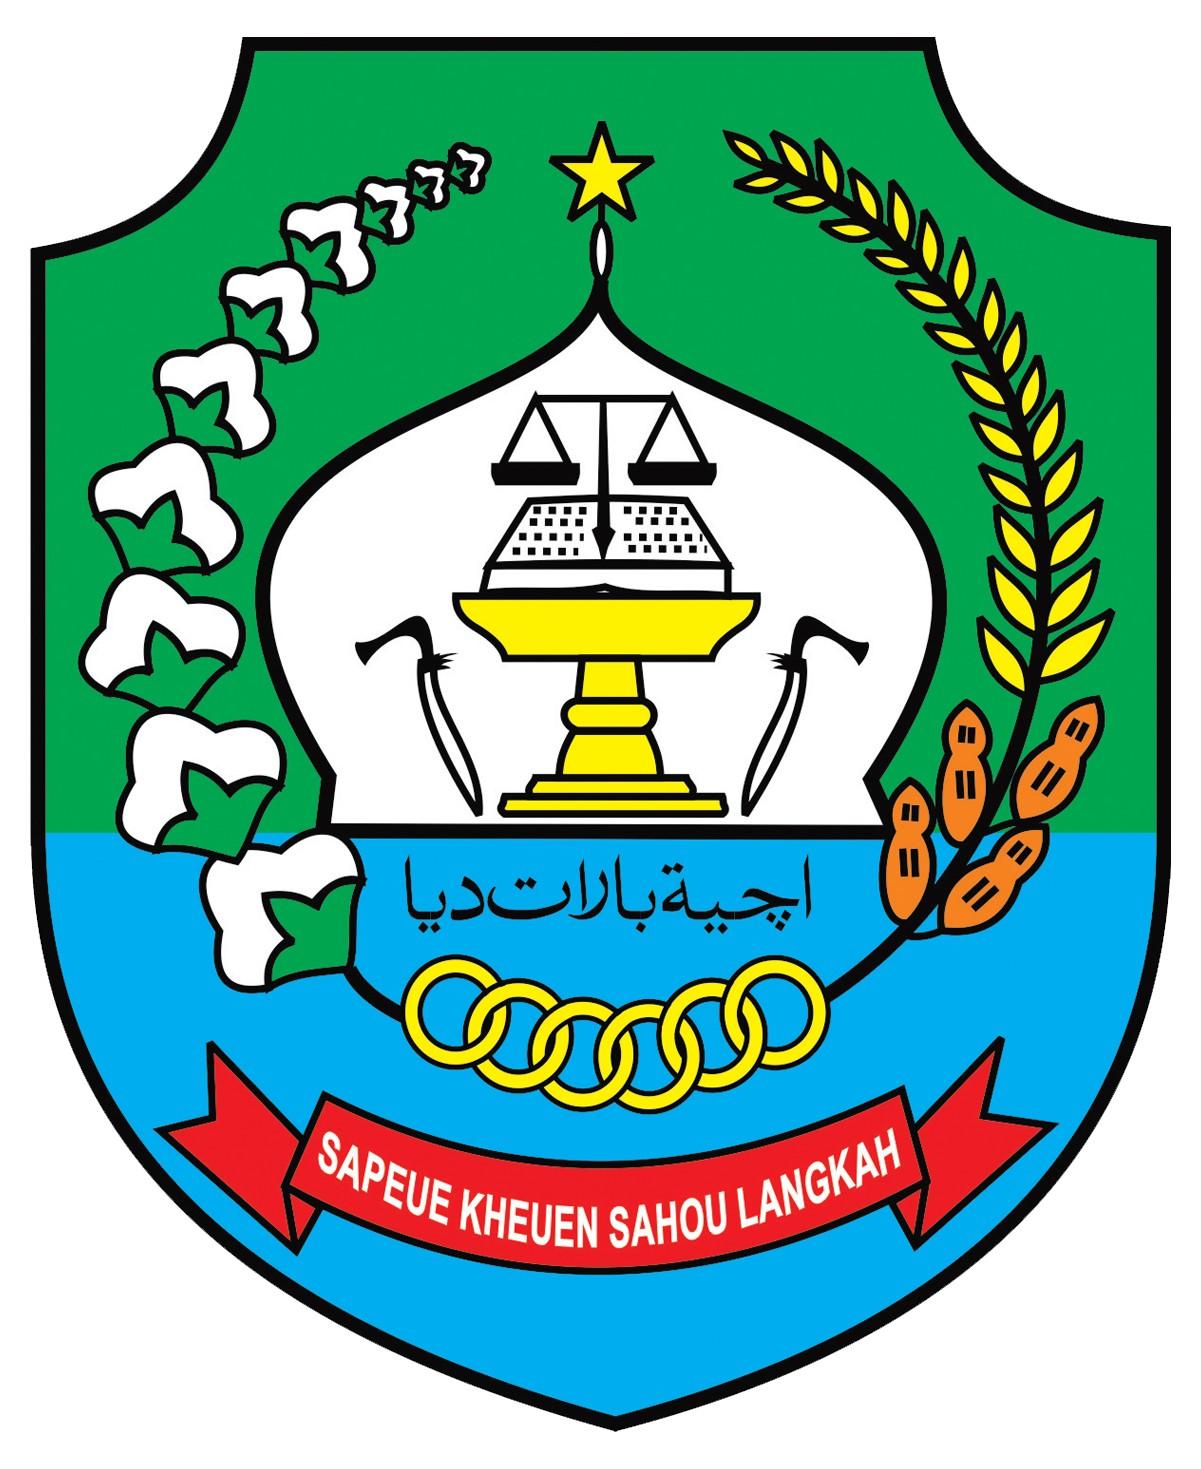 Pilkada Aceh Barat Daya (Abdya) 2017: Hasil Quick Count/Hitung Cepat